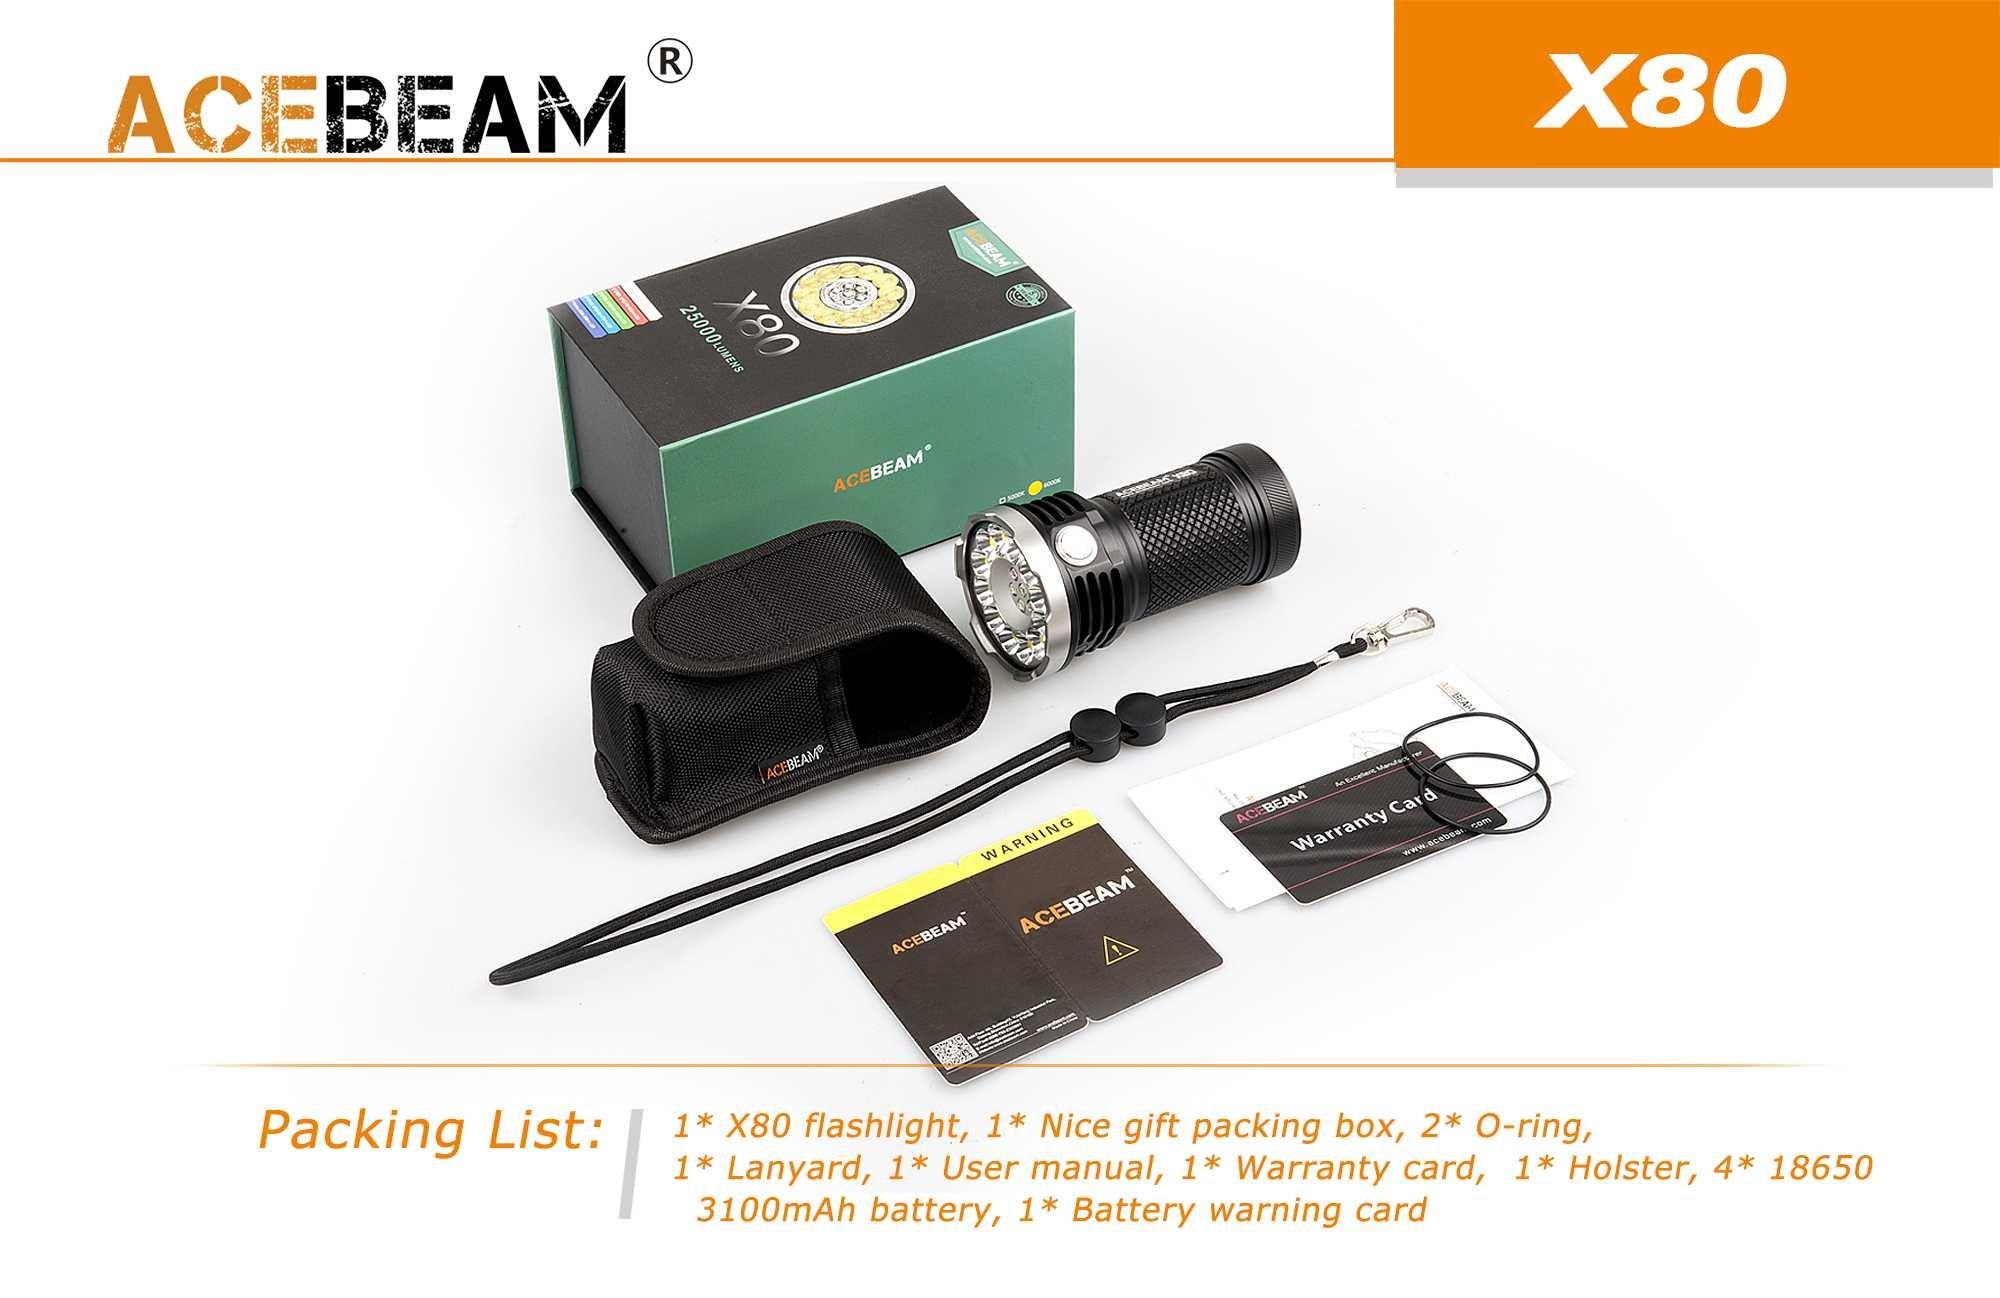 ACEBEAM X80 LED Flashlight 12x Cree XHP50.2 25000 Lumens 5-color Light Beam Flashlights Included 4 3100mah Batteries by Acebeam (Image #9)